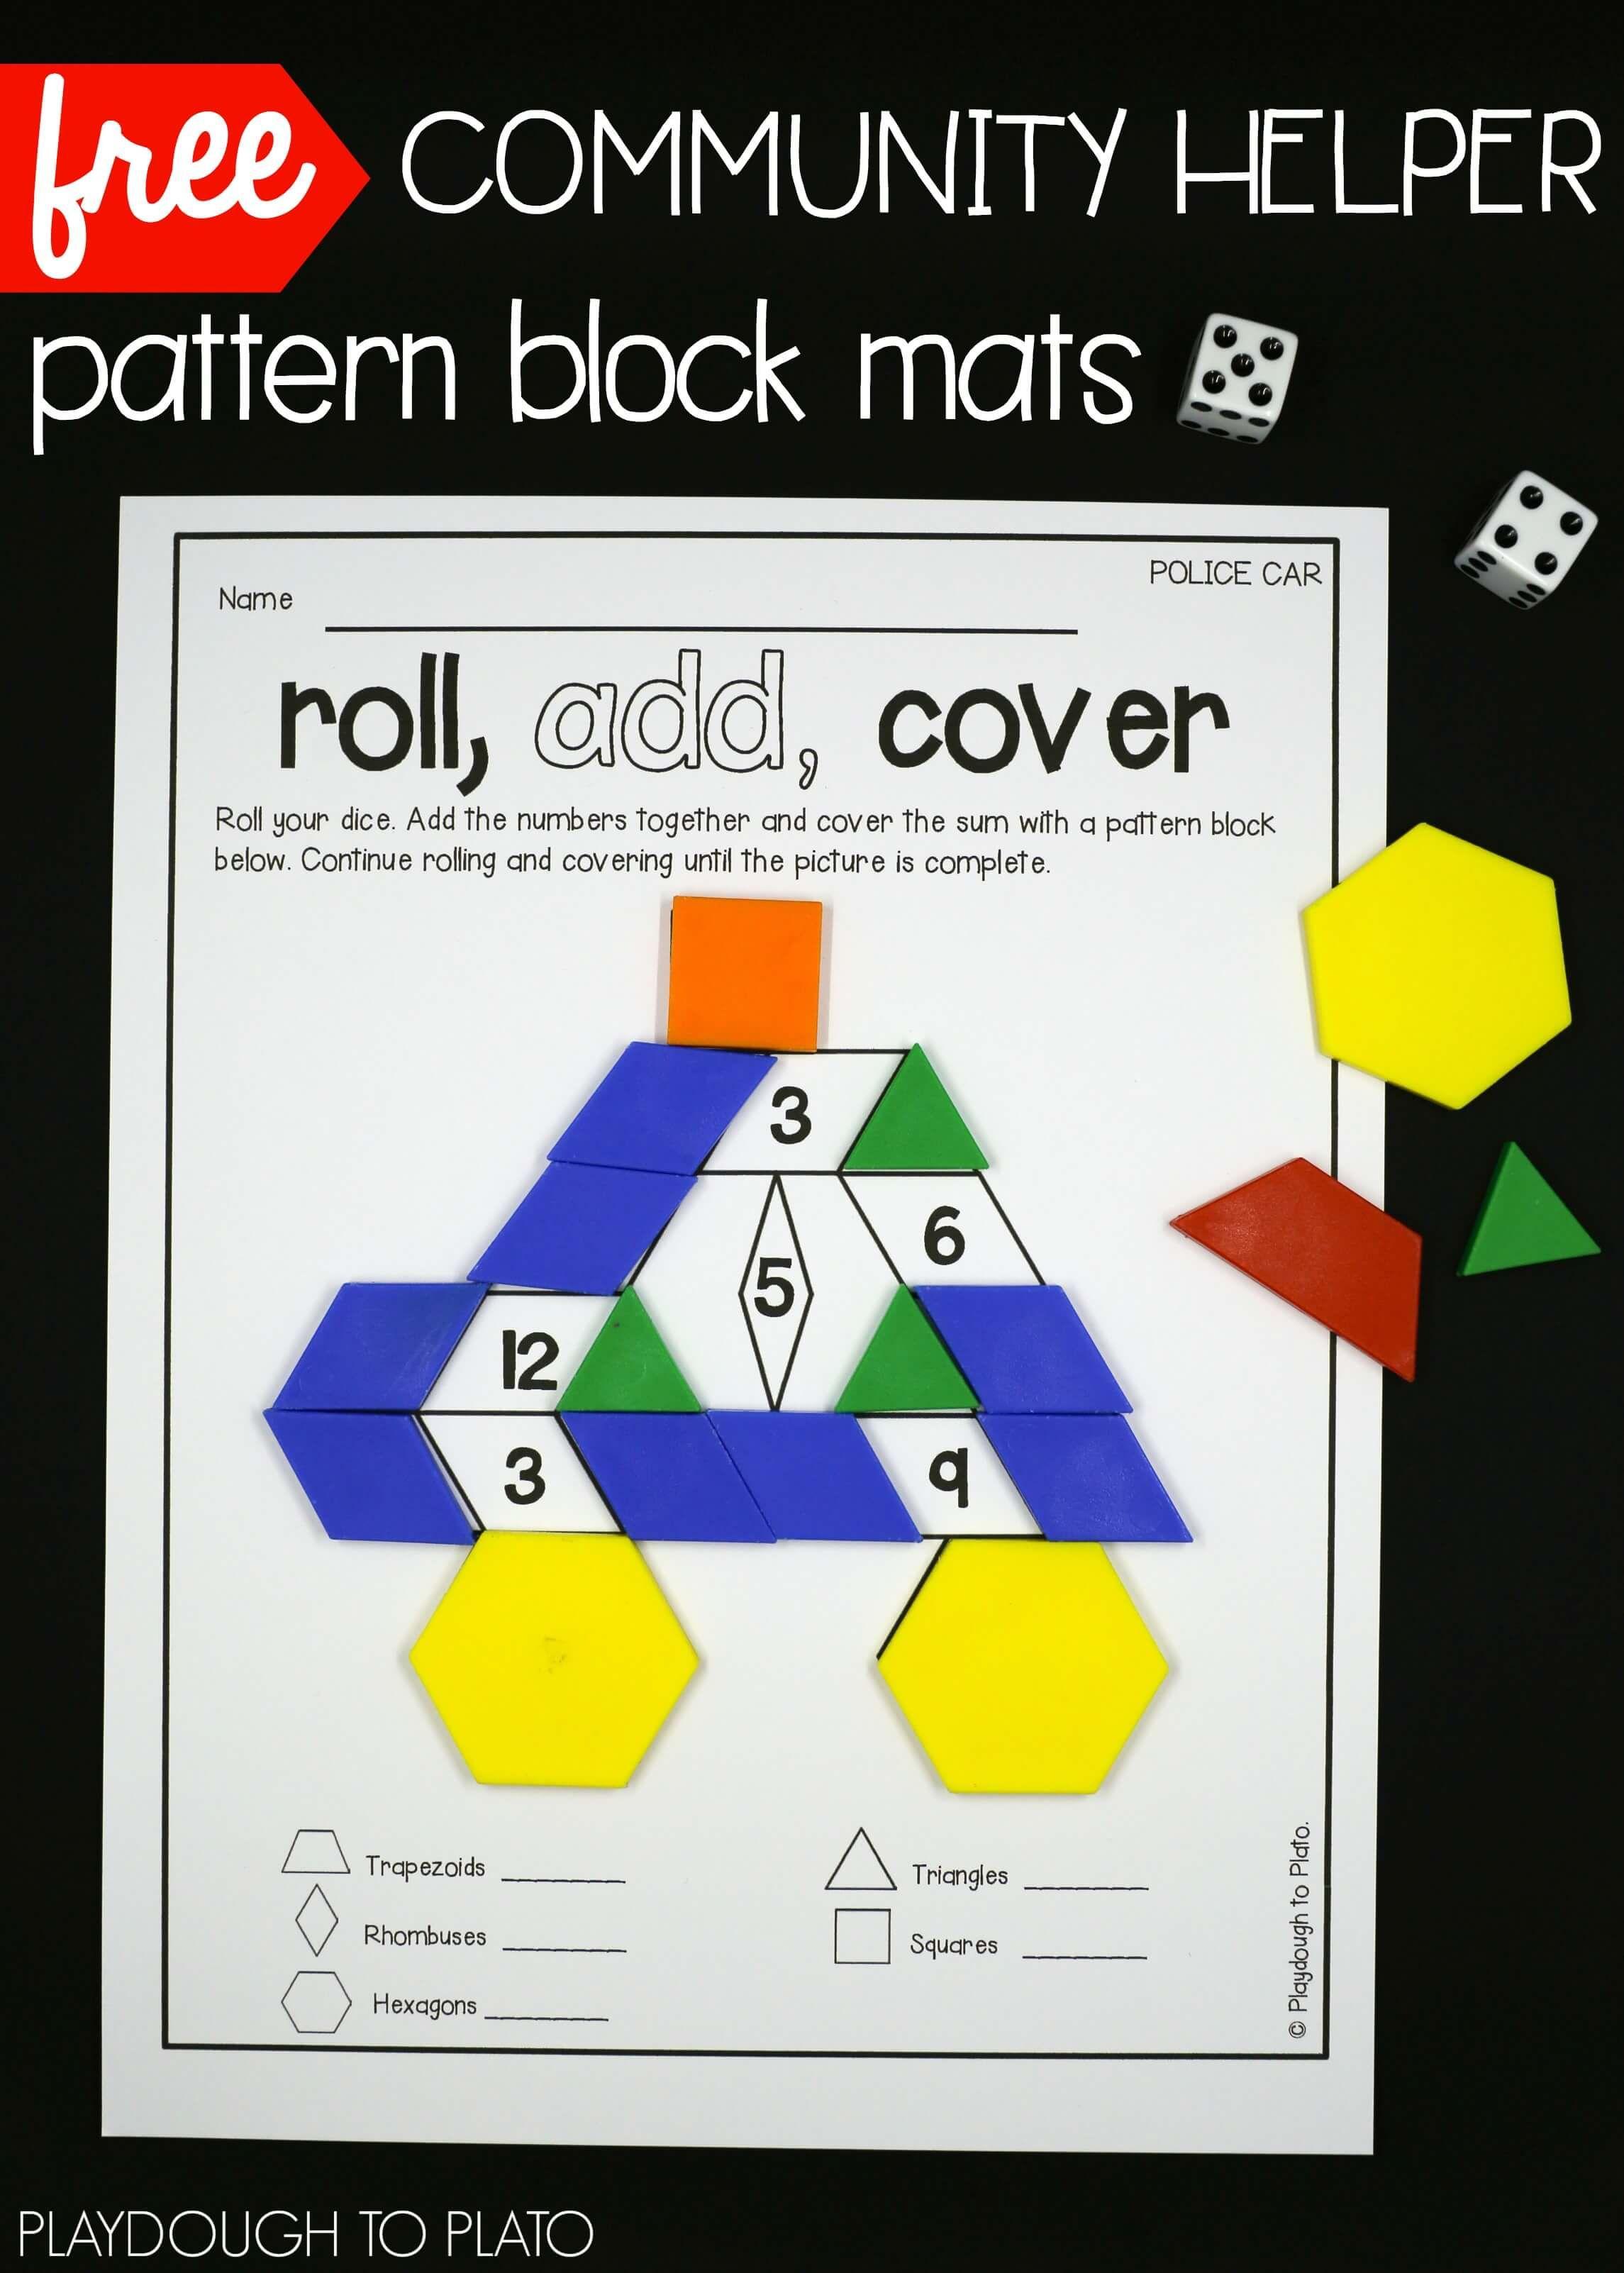 Community Helper Pattern Block Mats